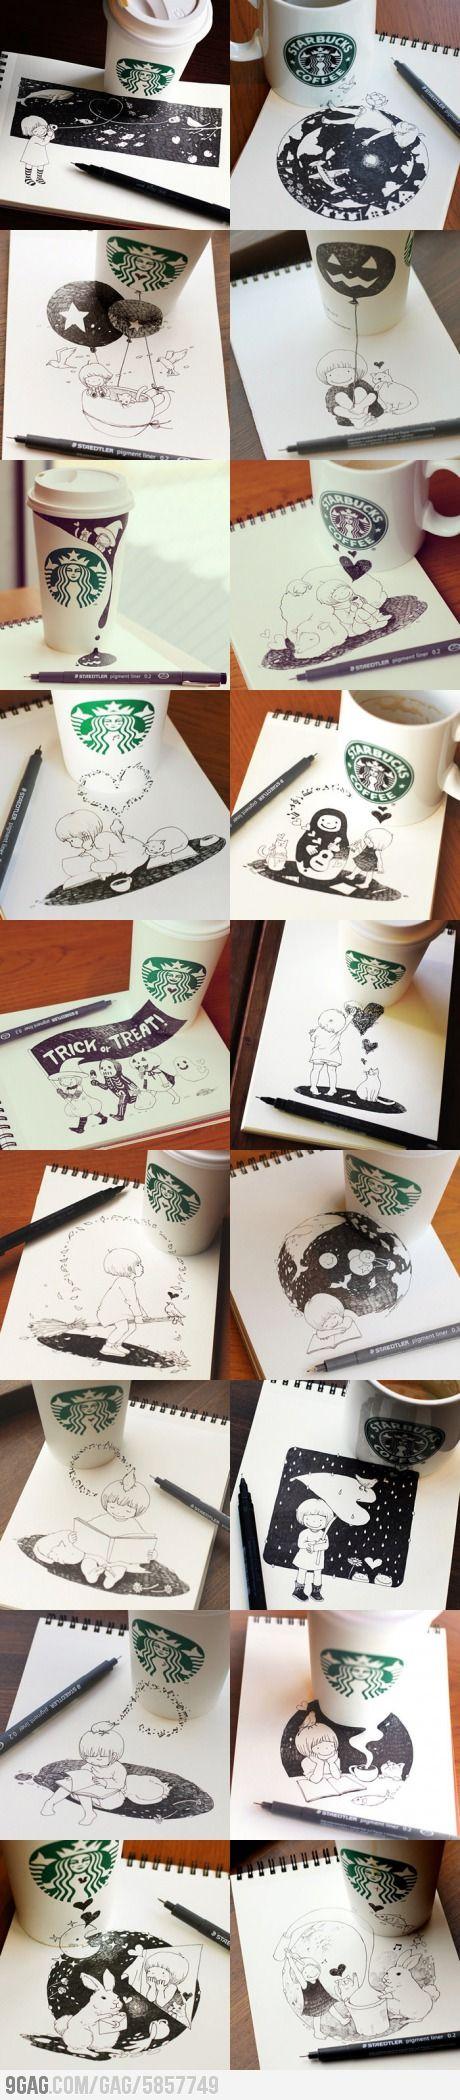 Awesome Starbucks Drawings by Tomoko Shintani